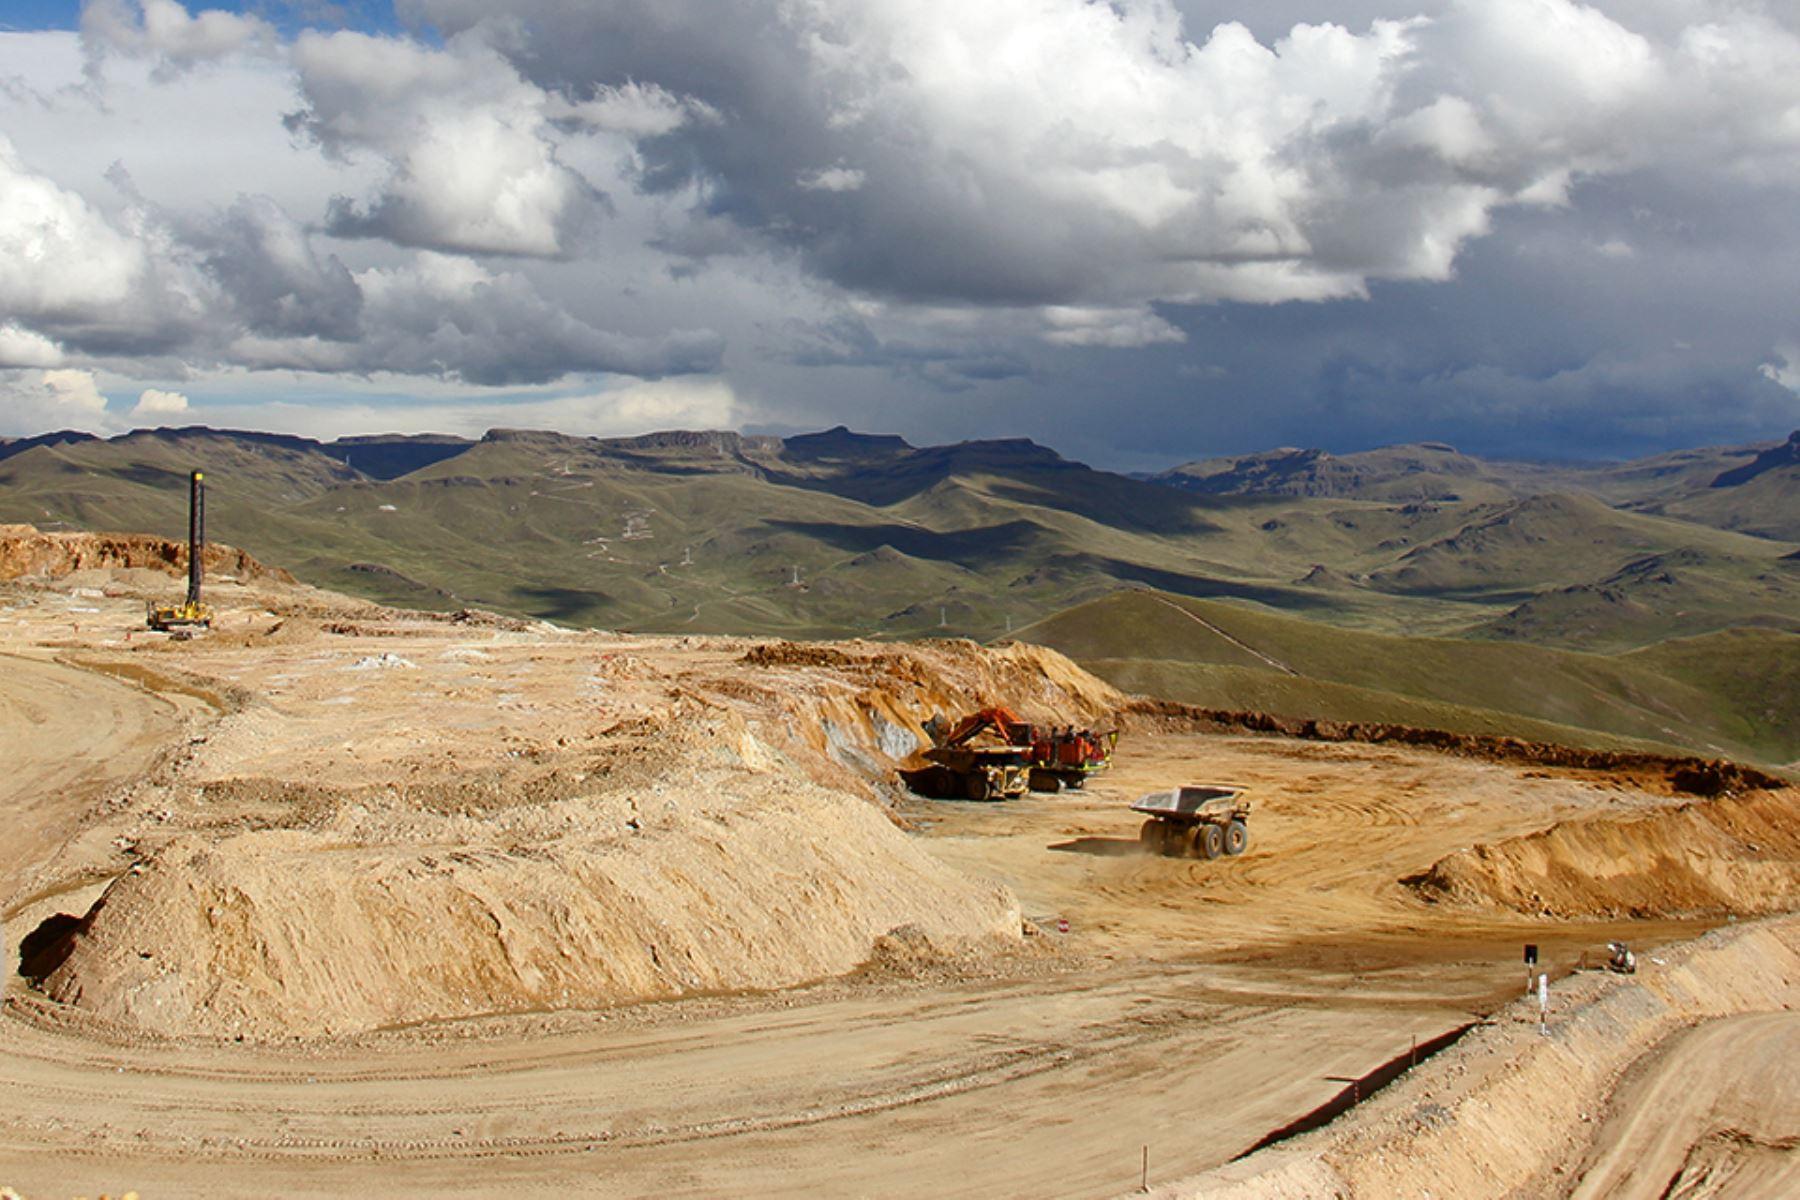 titulares-de-mineras-que-abandonen-sus-unidades-seran-inhabilitados-por-cinco-anos